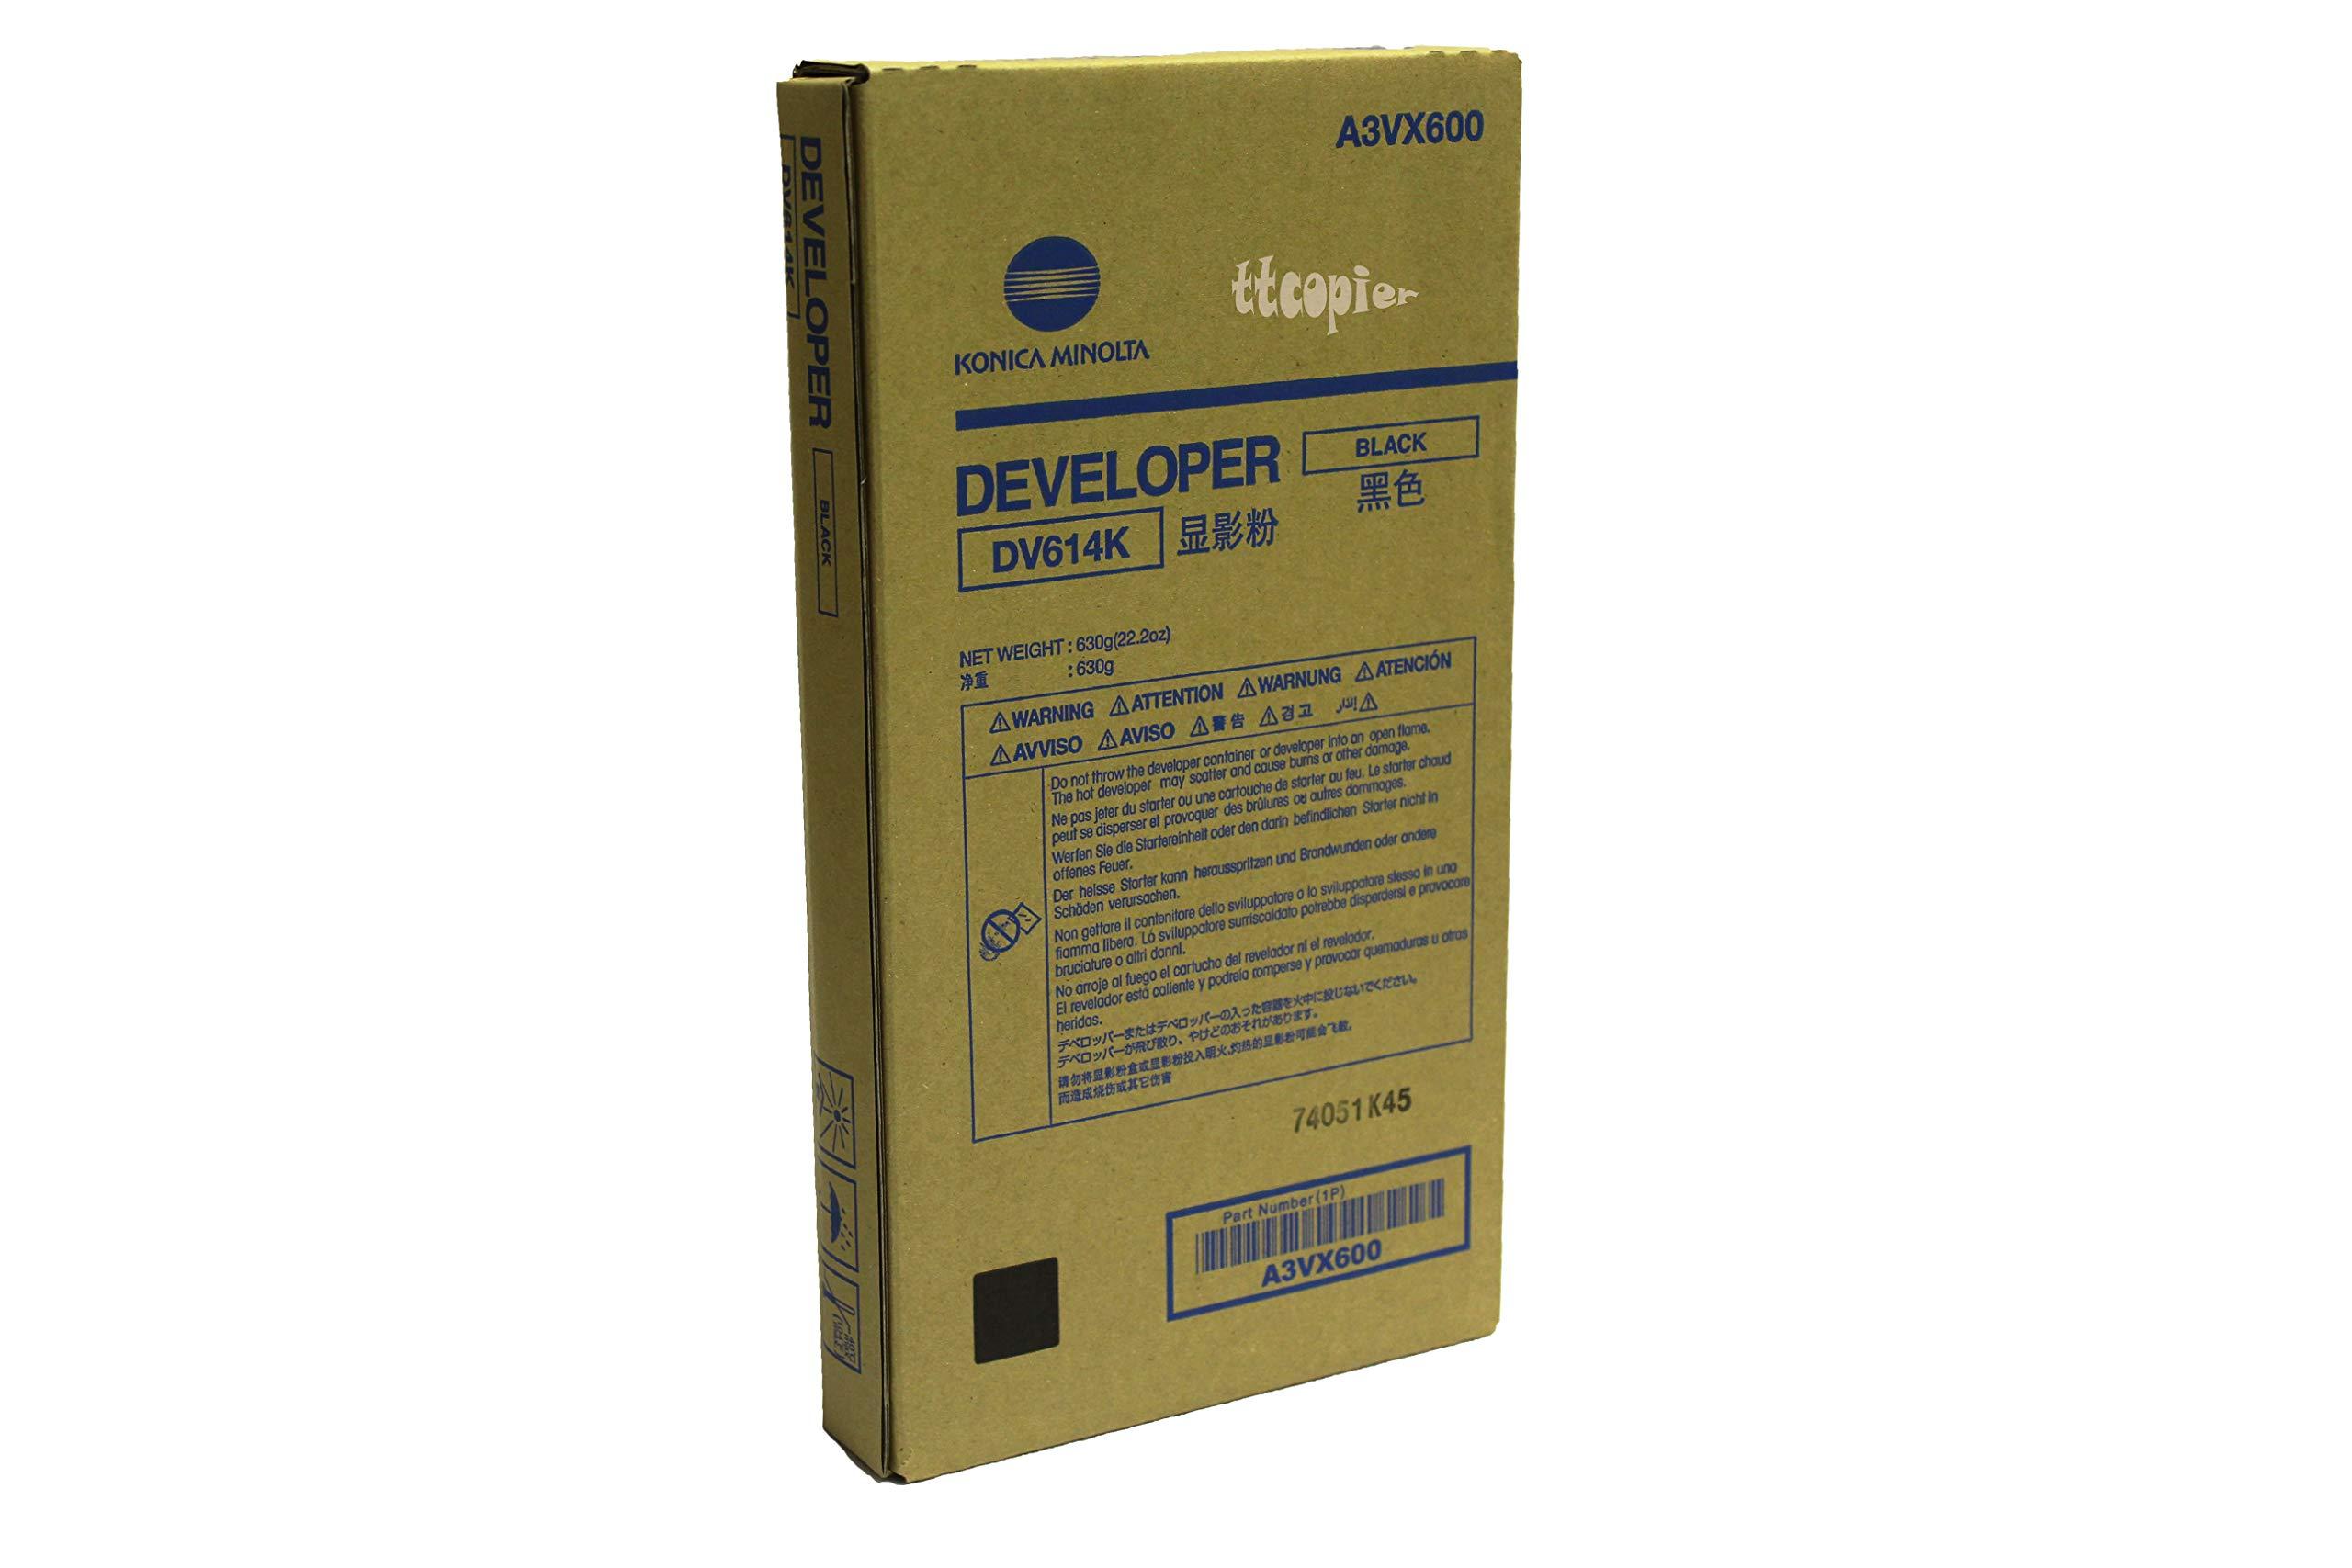 Genuine Konica Minolta A3VX600 DV614K Black Developer for C1060 C1070